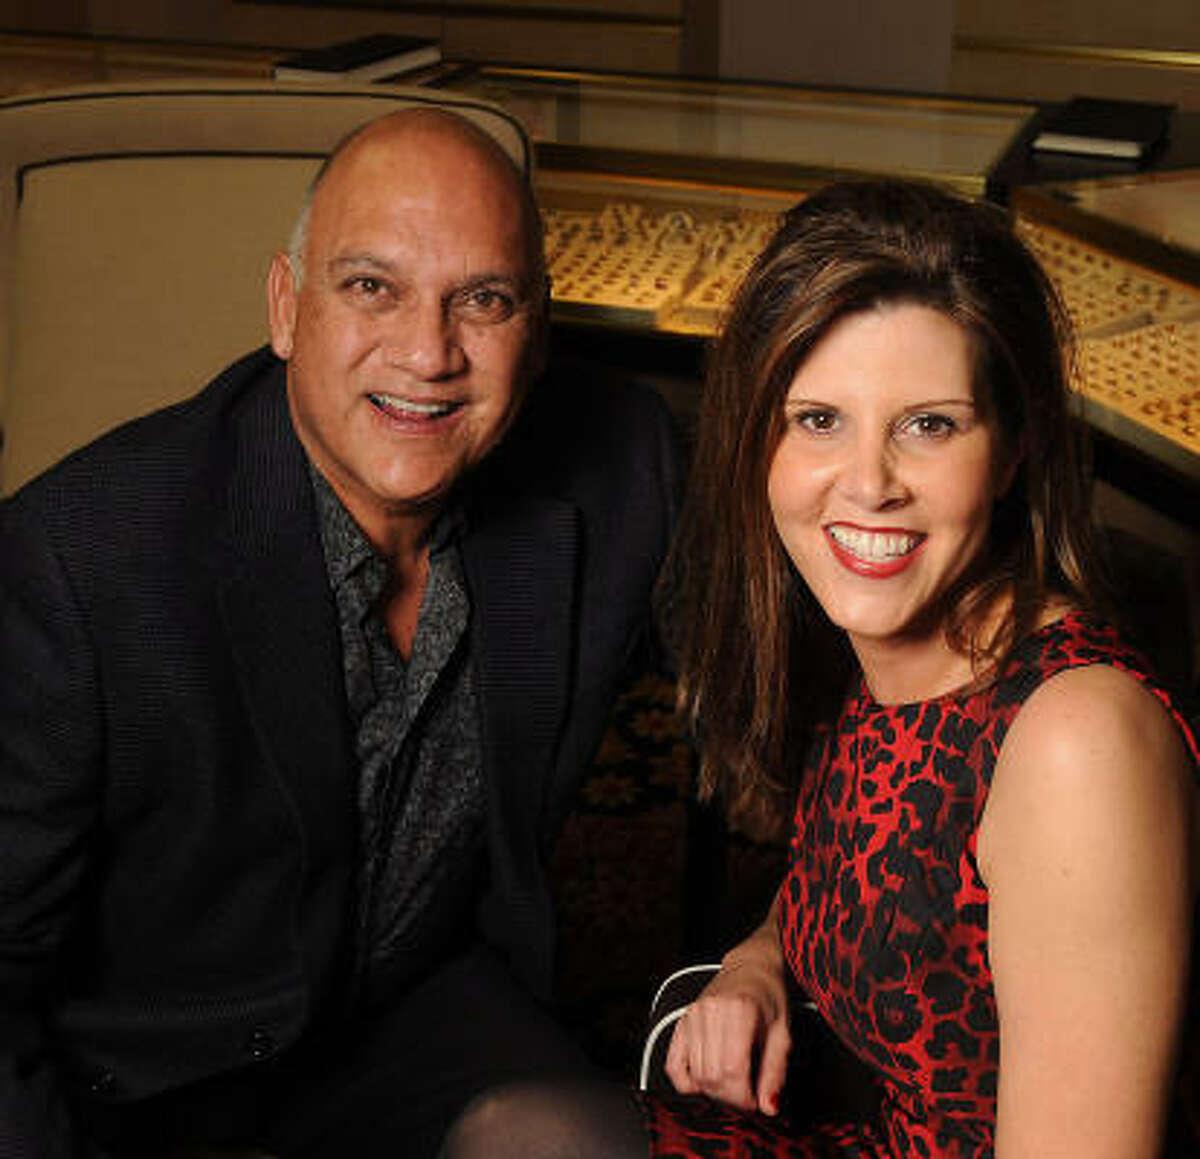 Fred Aguilar and Jennifer Miller